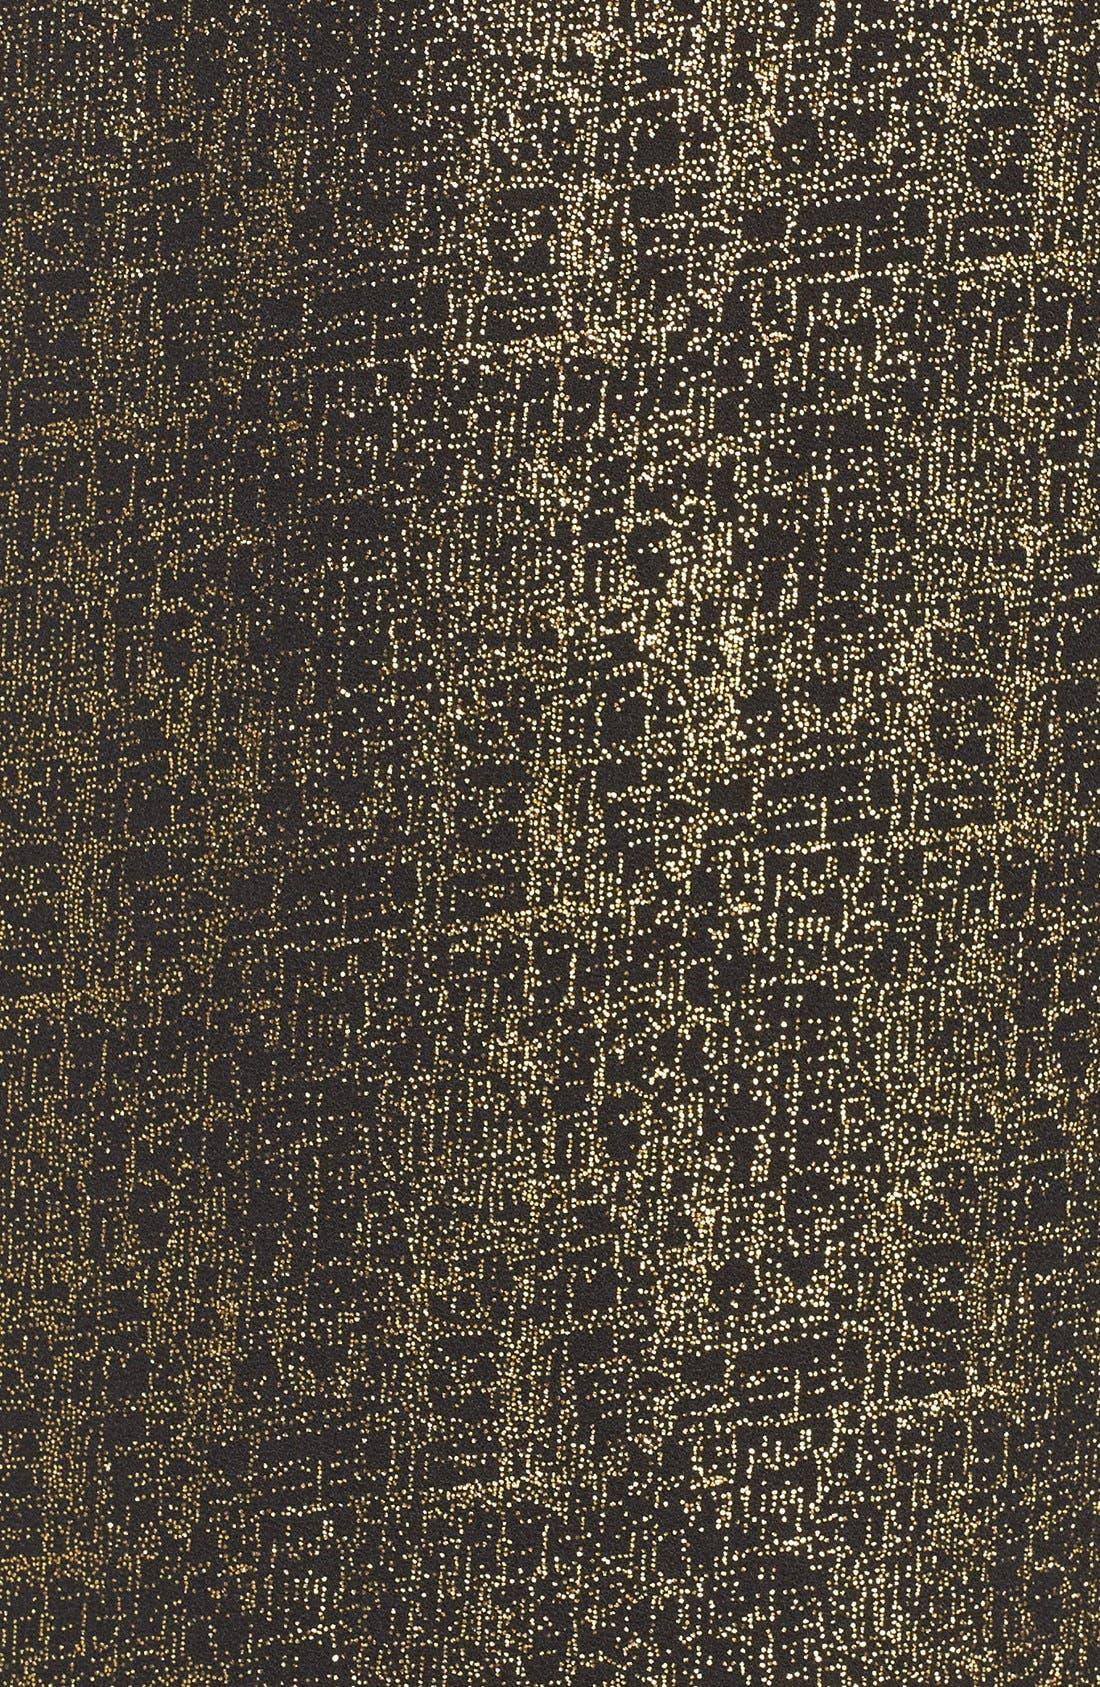 Amy Metallic Shift Dress,                             Alternate thumbnail 6, color,                             Black/ Gold